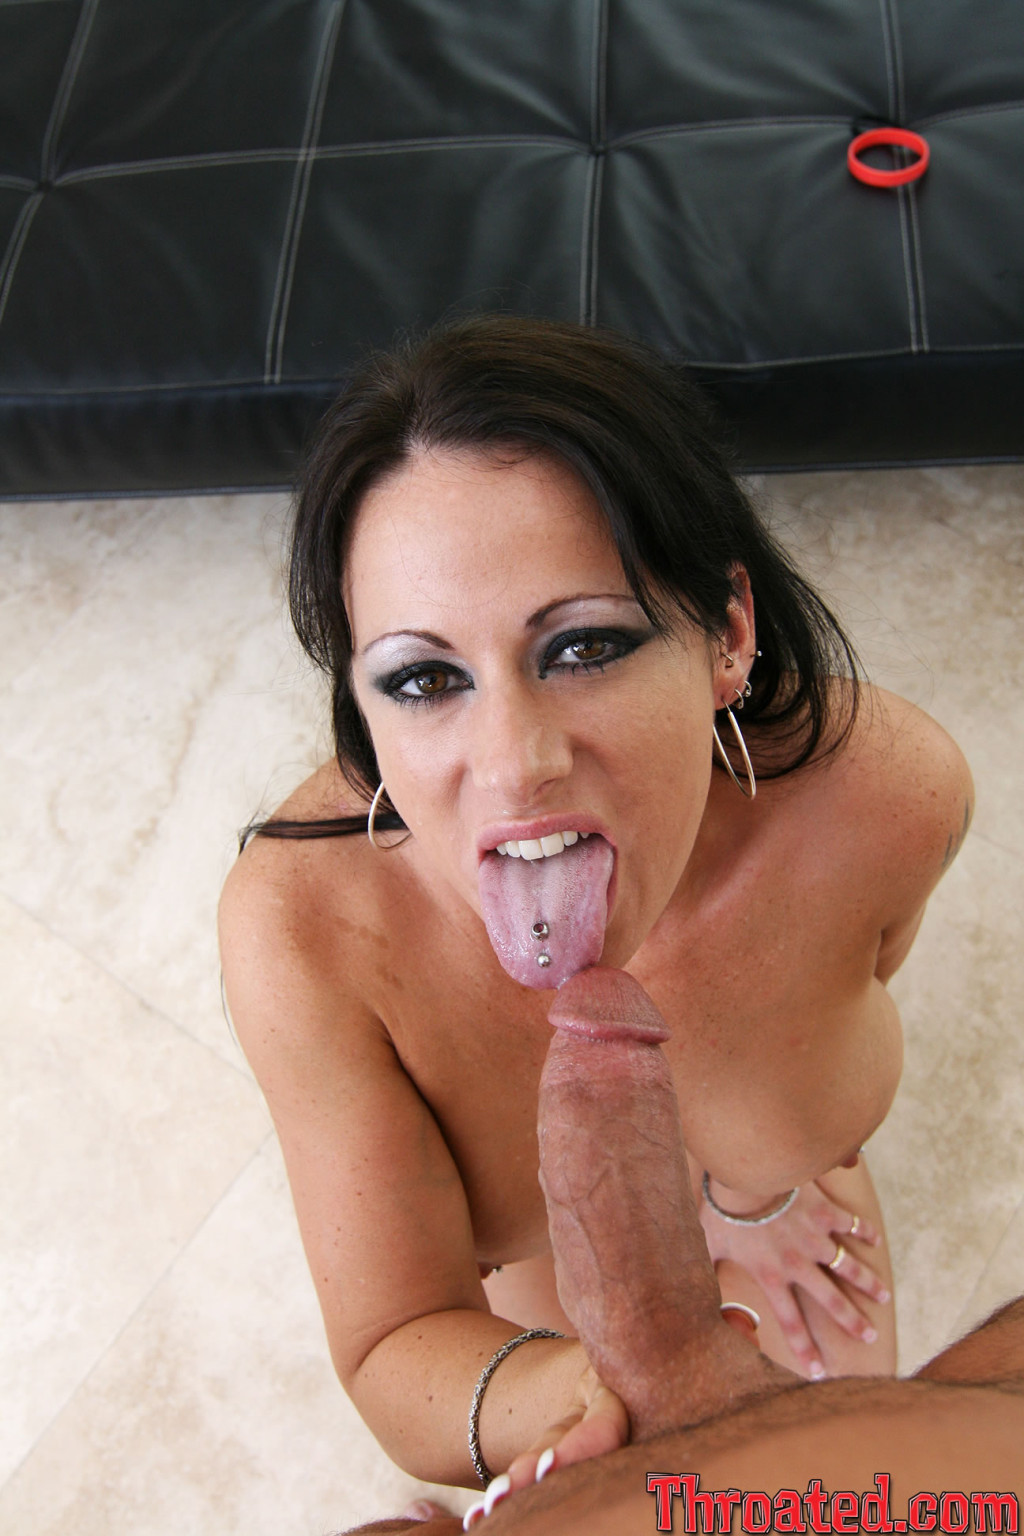 Глубокая глотка - Порно галерея № 3005903